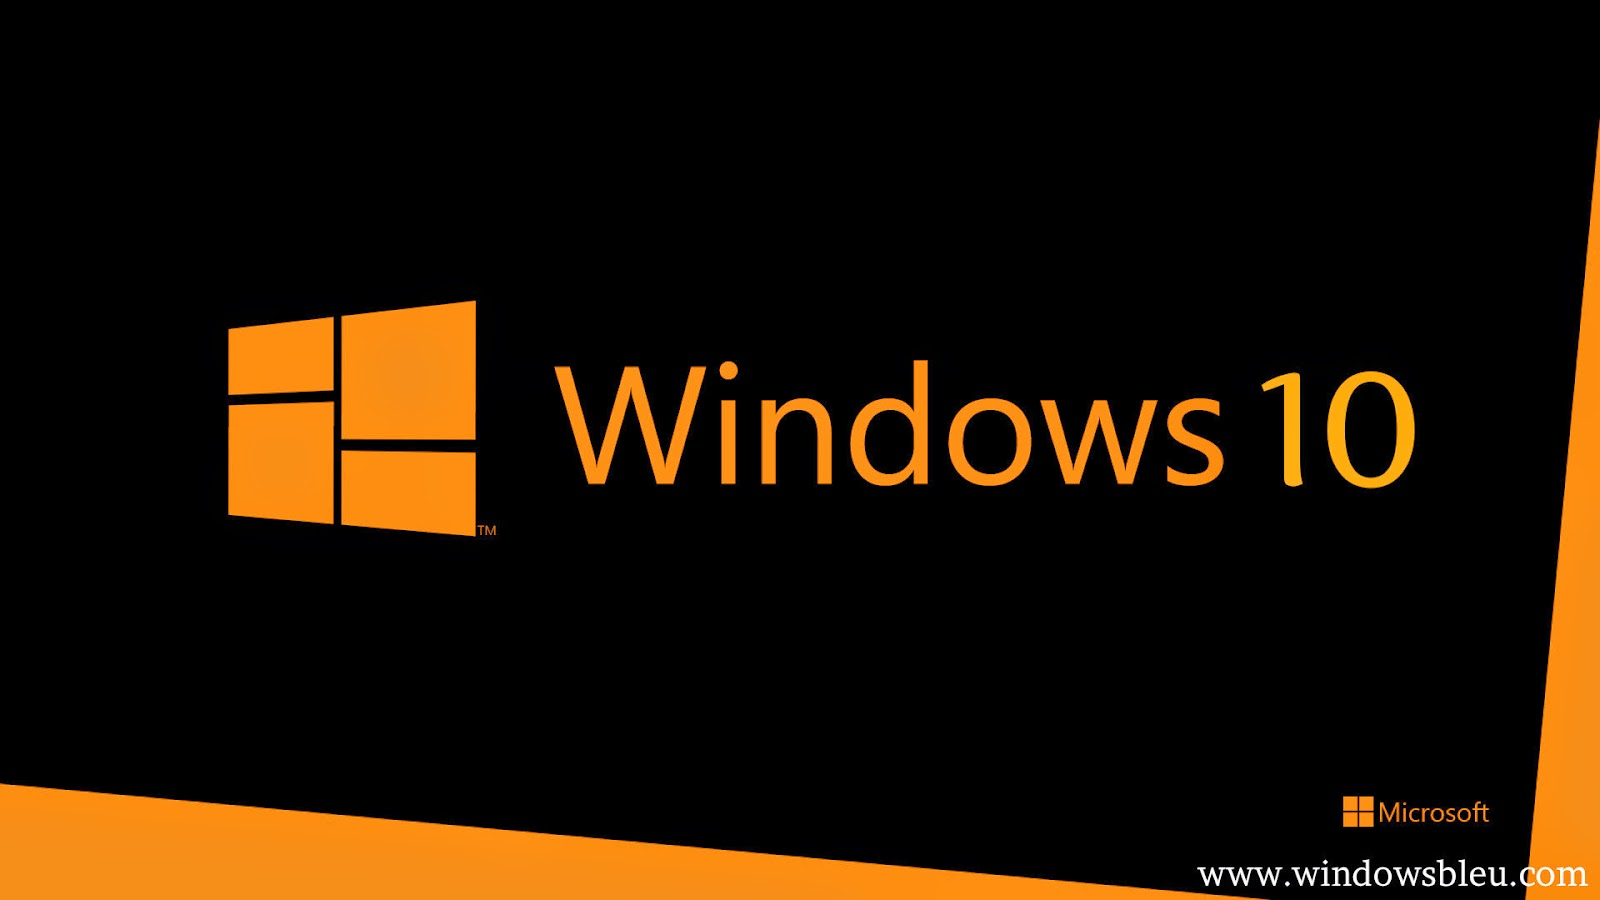 windows 10 wallpaper pack,text,font,orange,brand,logo